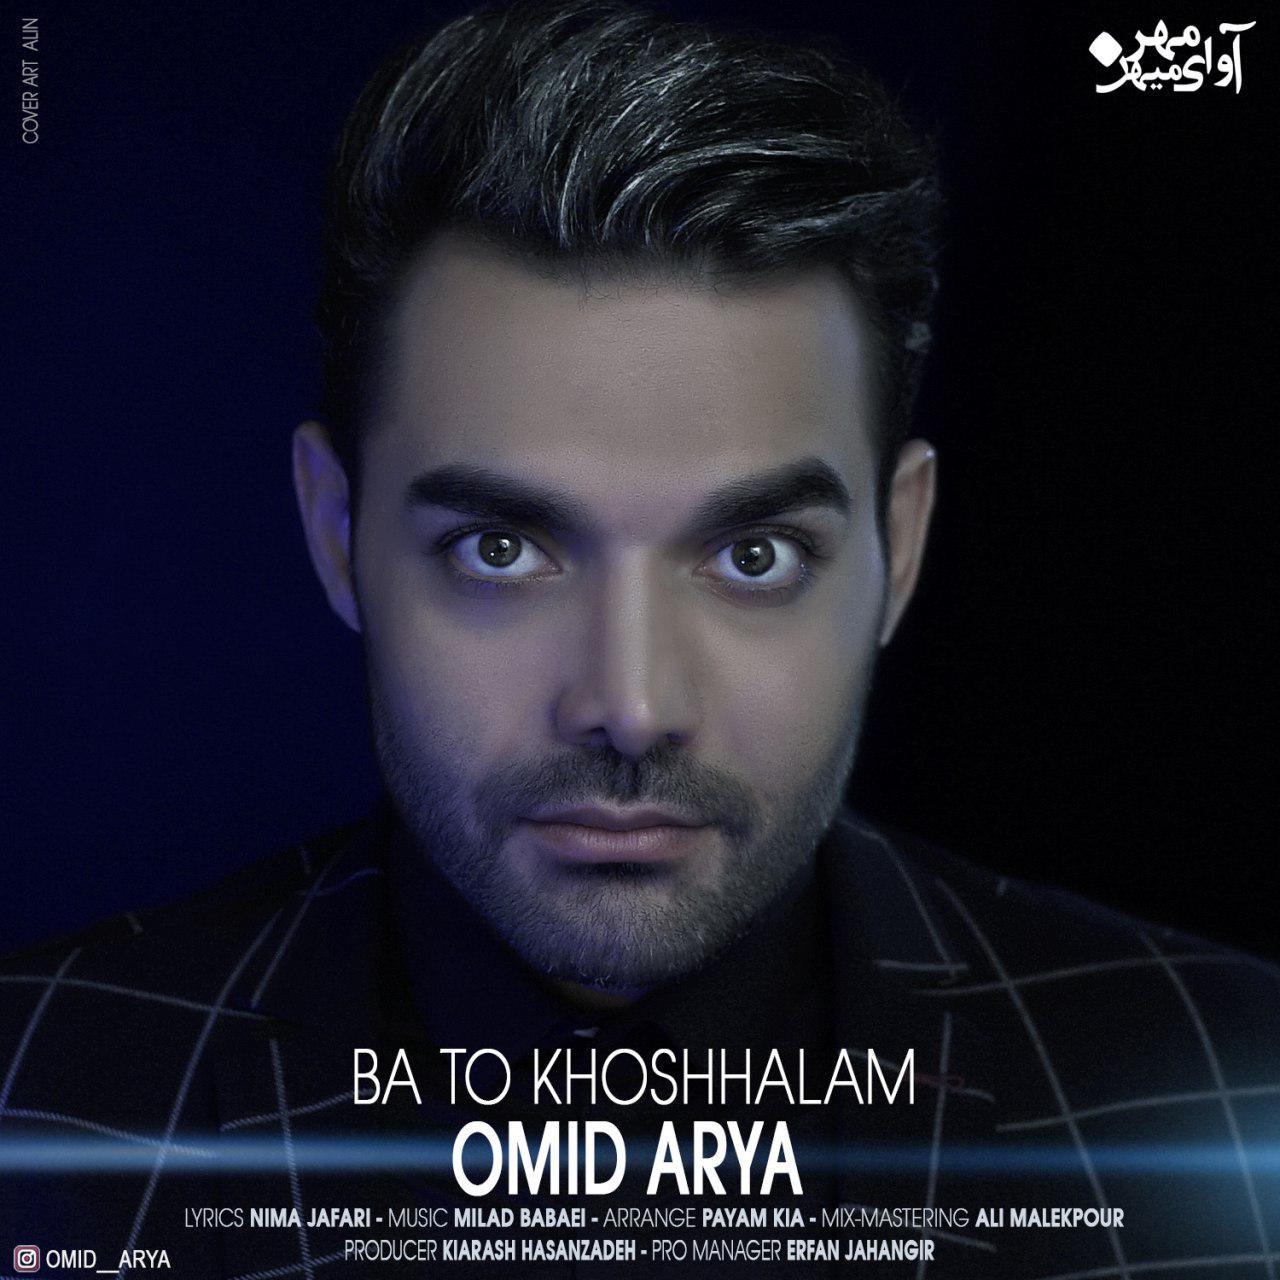 Omid Arya – Ba To Khoshhalam